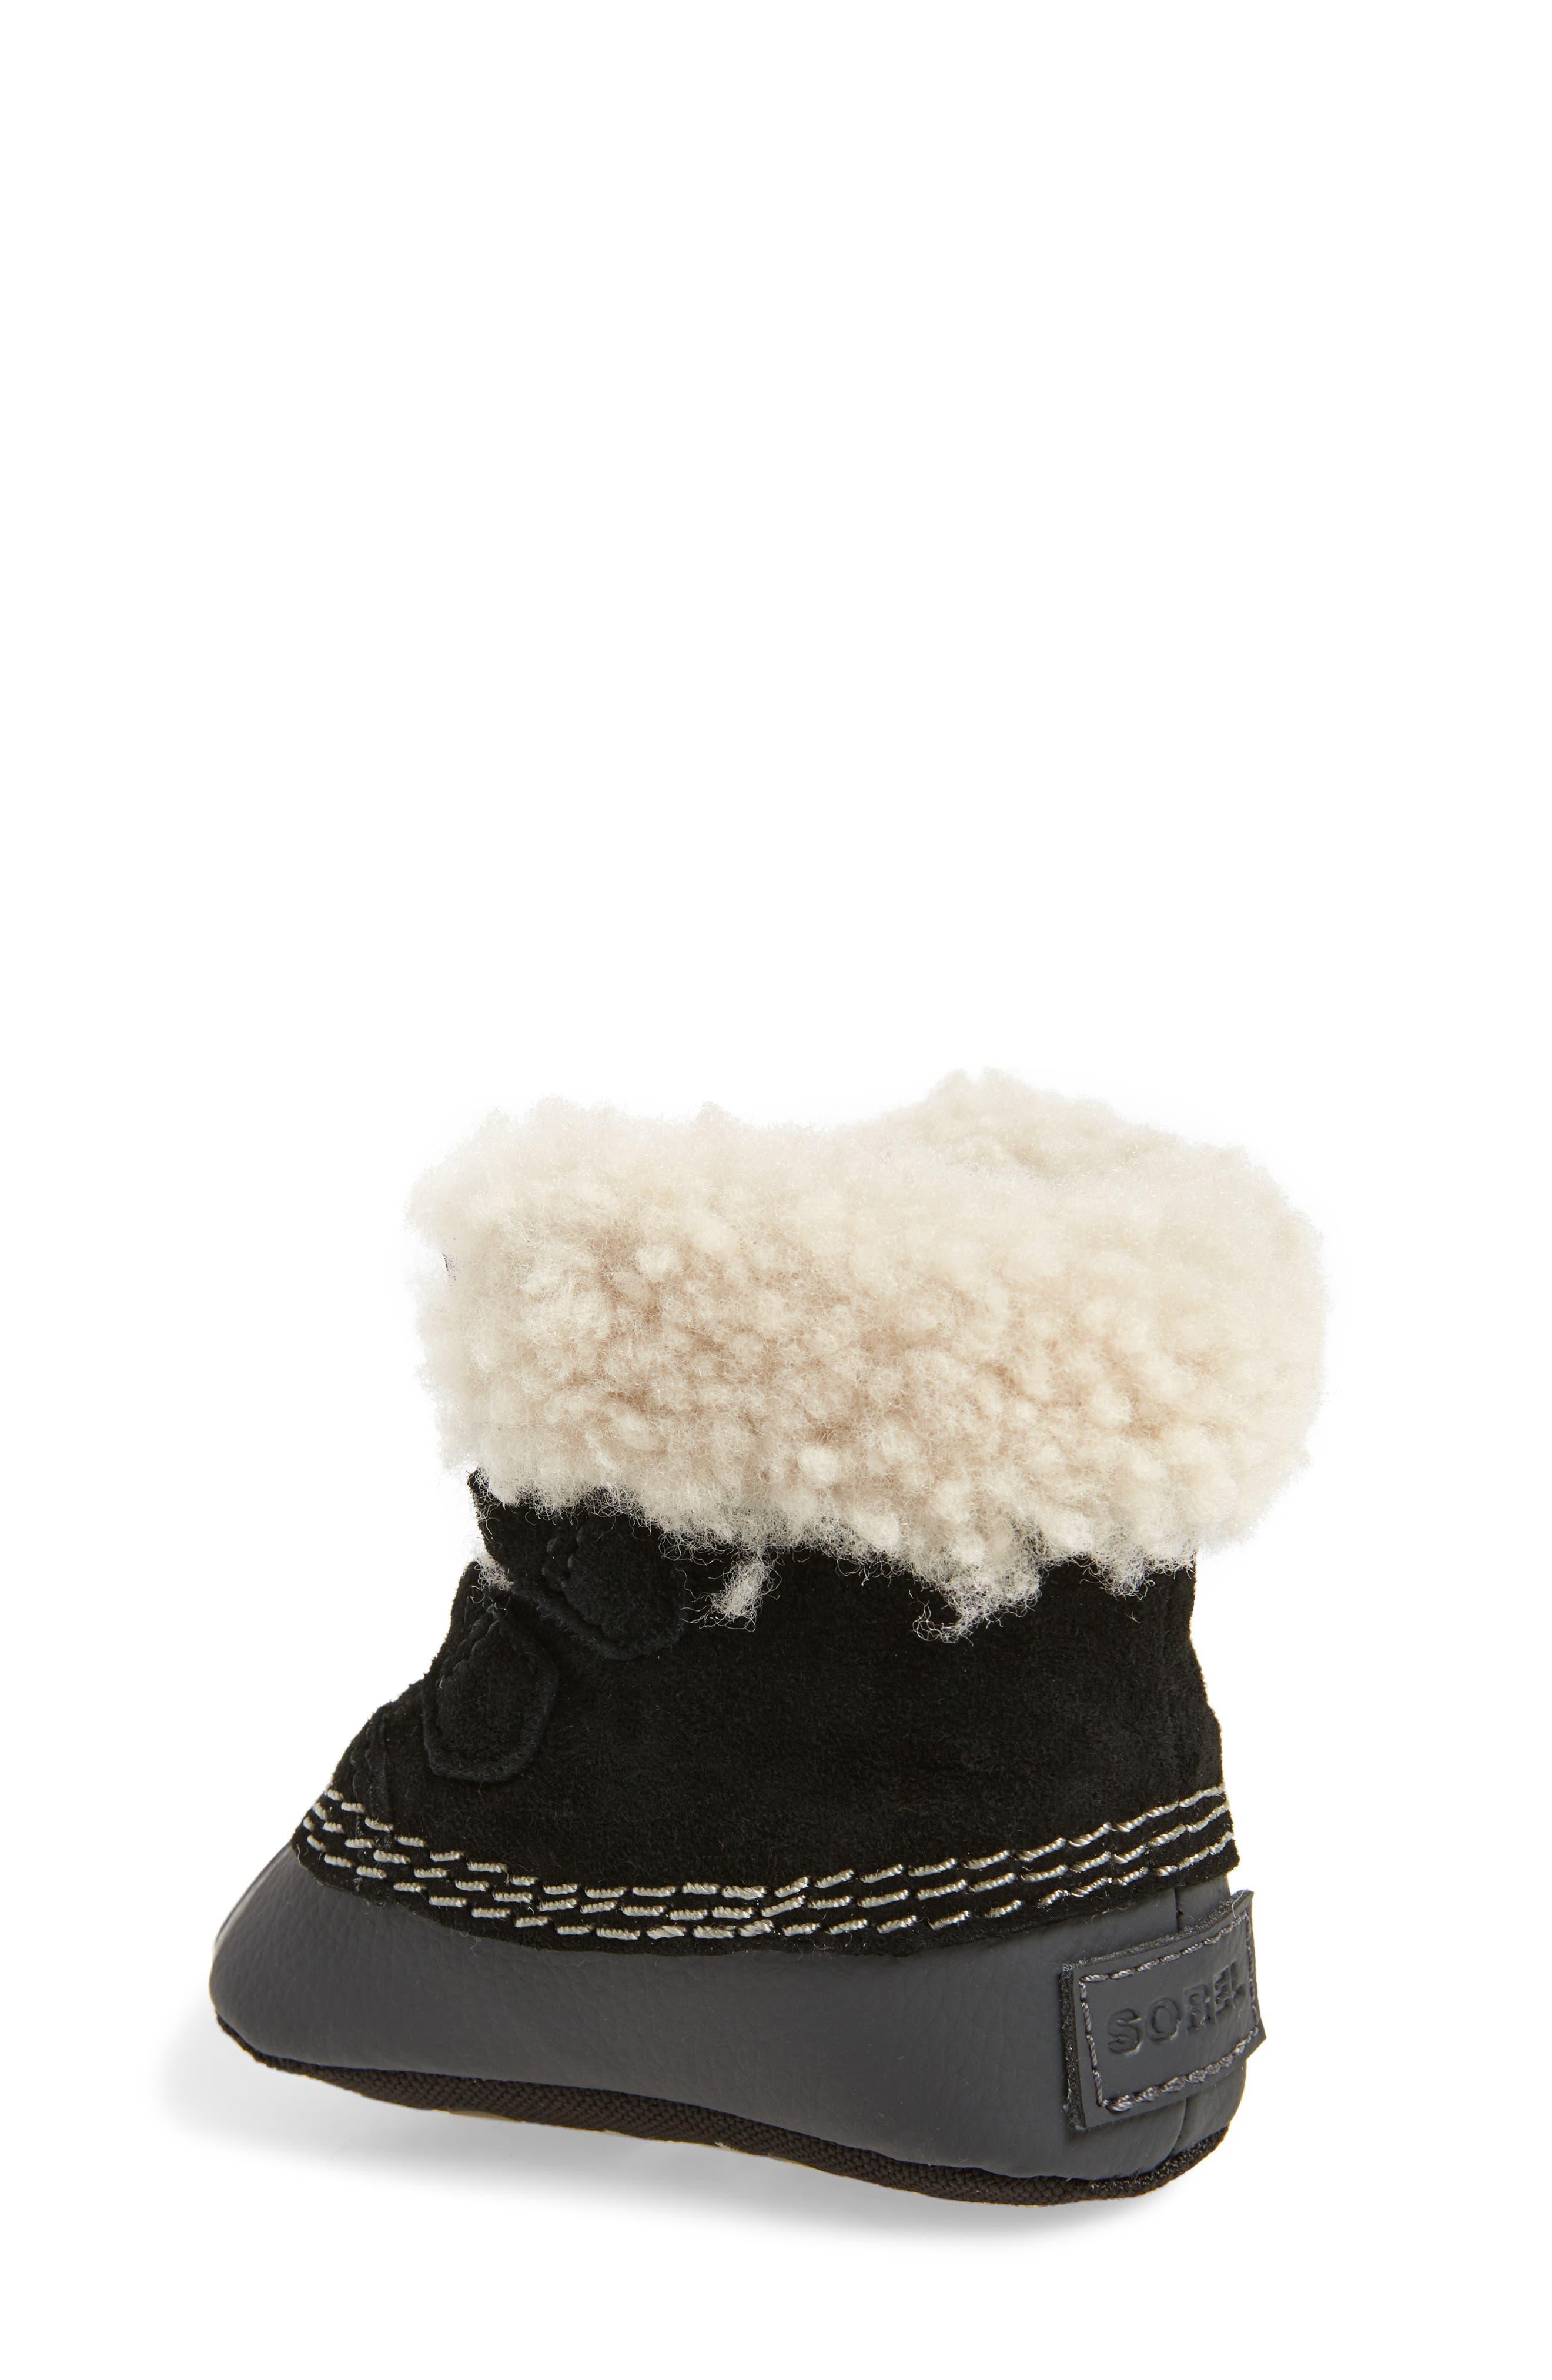 Caribootie Genuine Shearling Crib Shoe,                             Alternate thumbnail 2, color,                             001